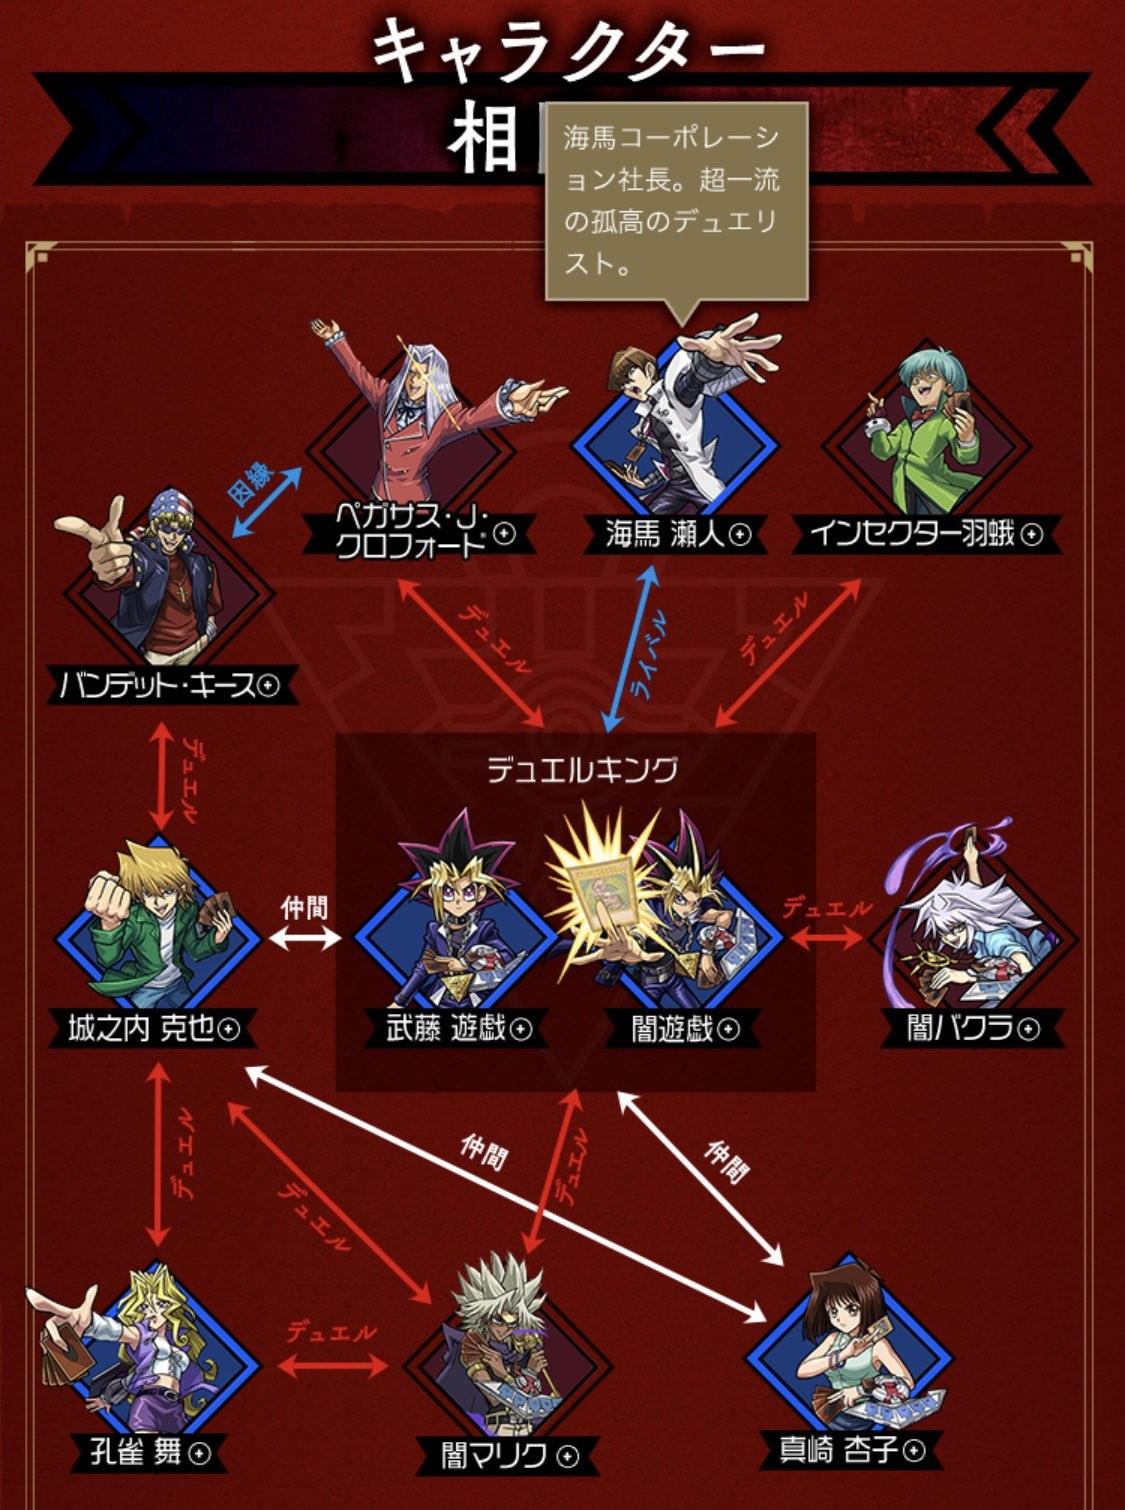 [Sad news] Correlation diagram of Yu-Gi-Oh characters made by Monst w: w: w: w: w: w: w: w: w: w: w: